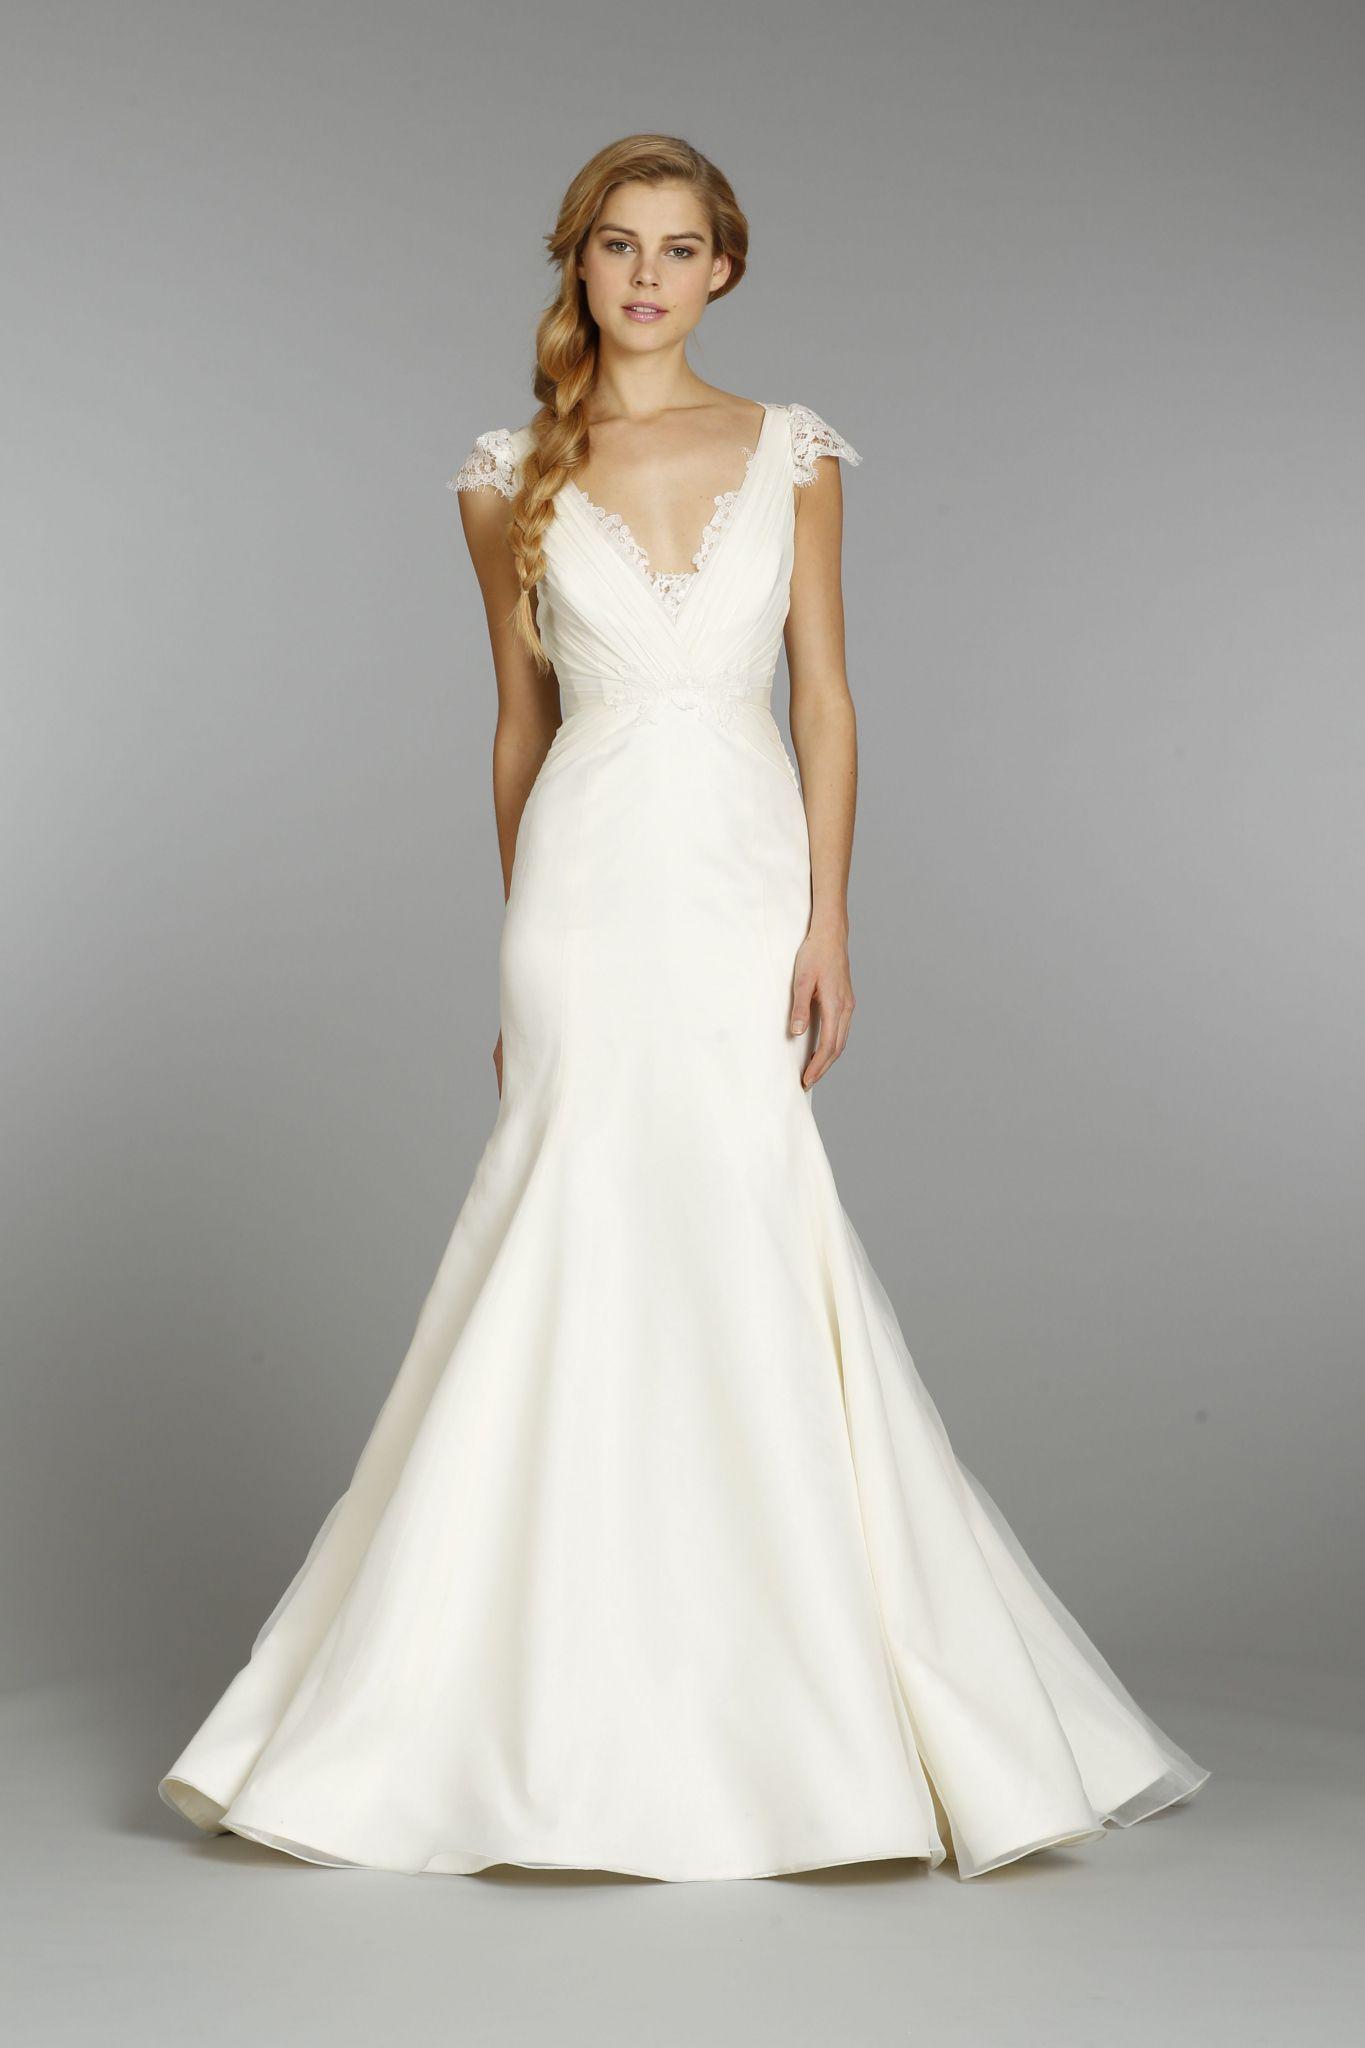 Best Wedding Dress For Hourglass Shape